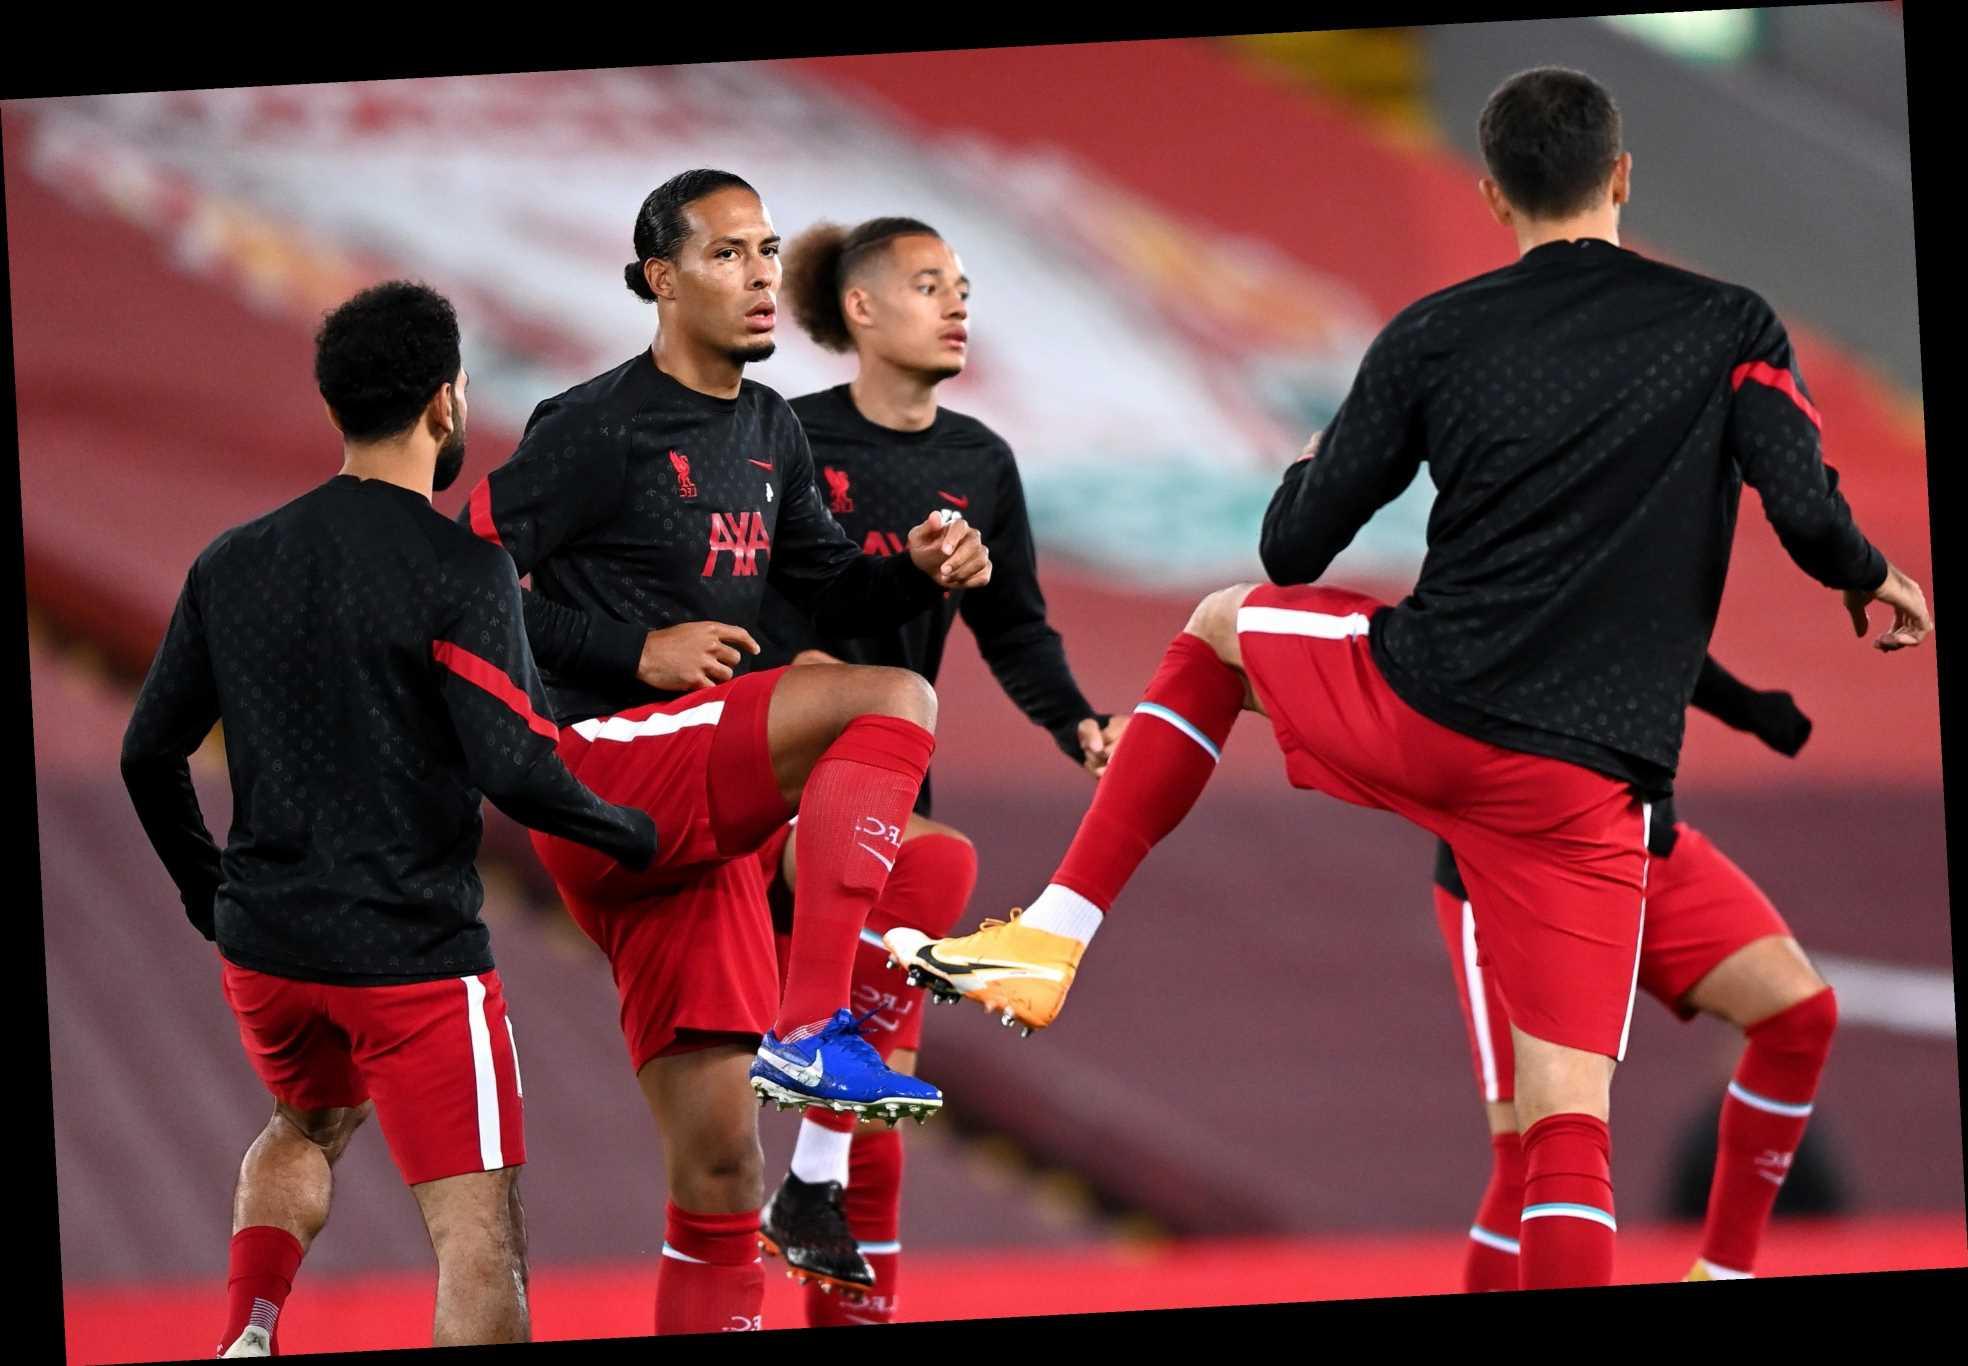 Aston Villa Vs Liverpool Free Live Stream Tv Channel Kick Off Time And Team News For Premier League Clash Wstale Com